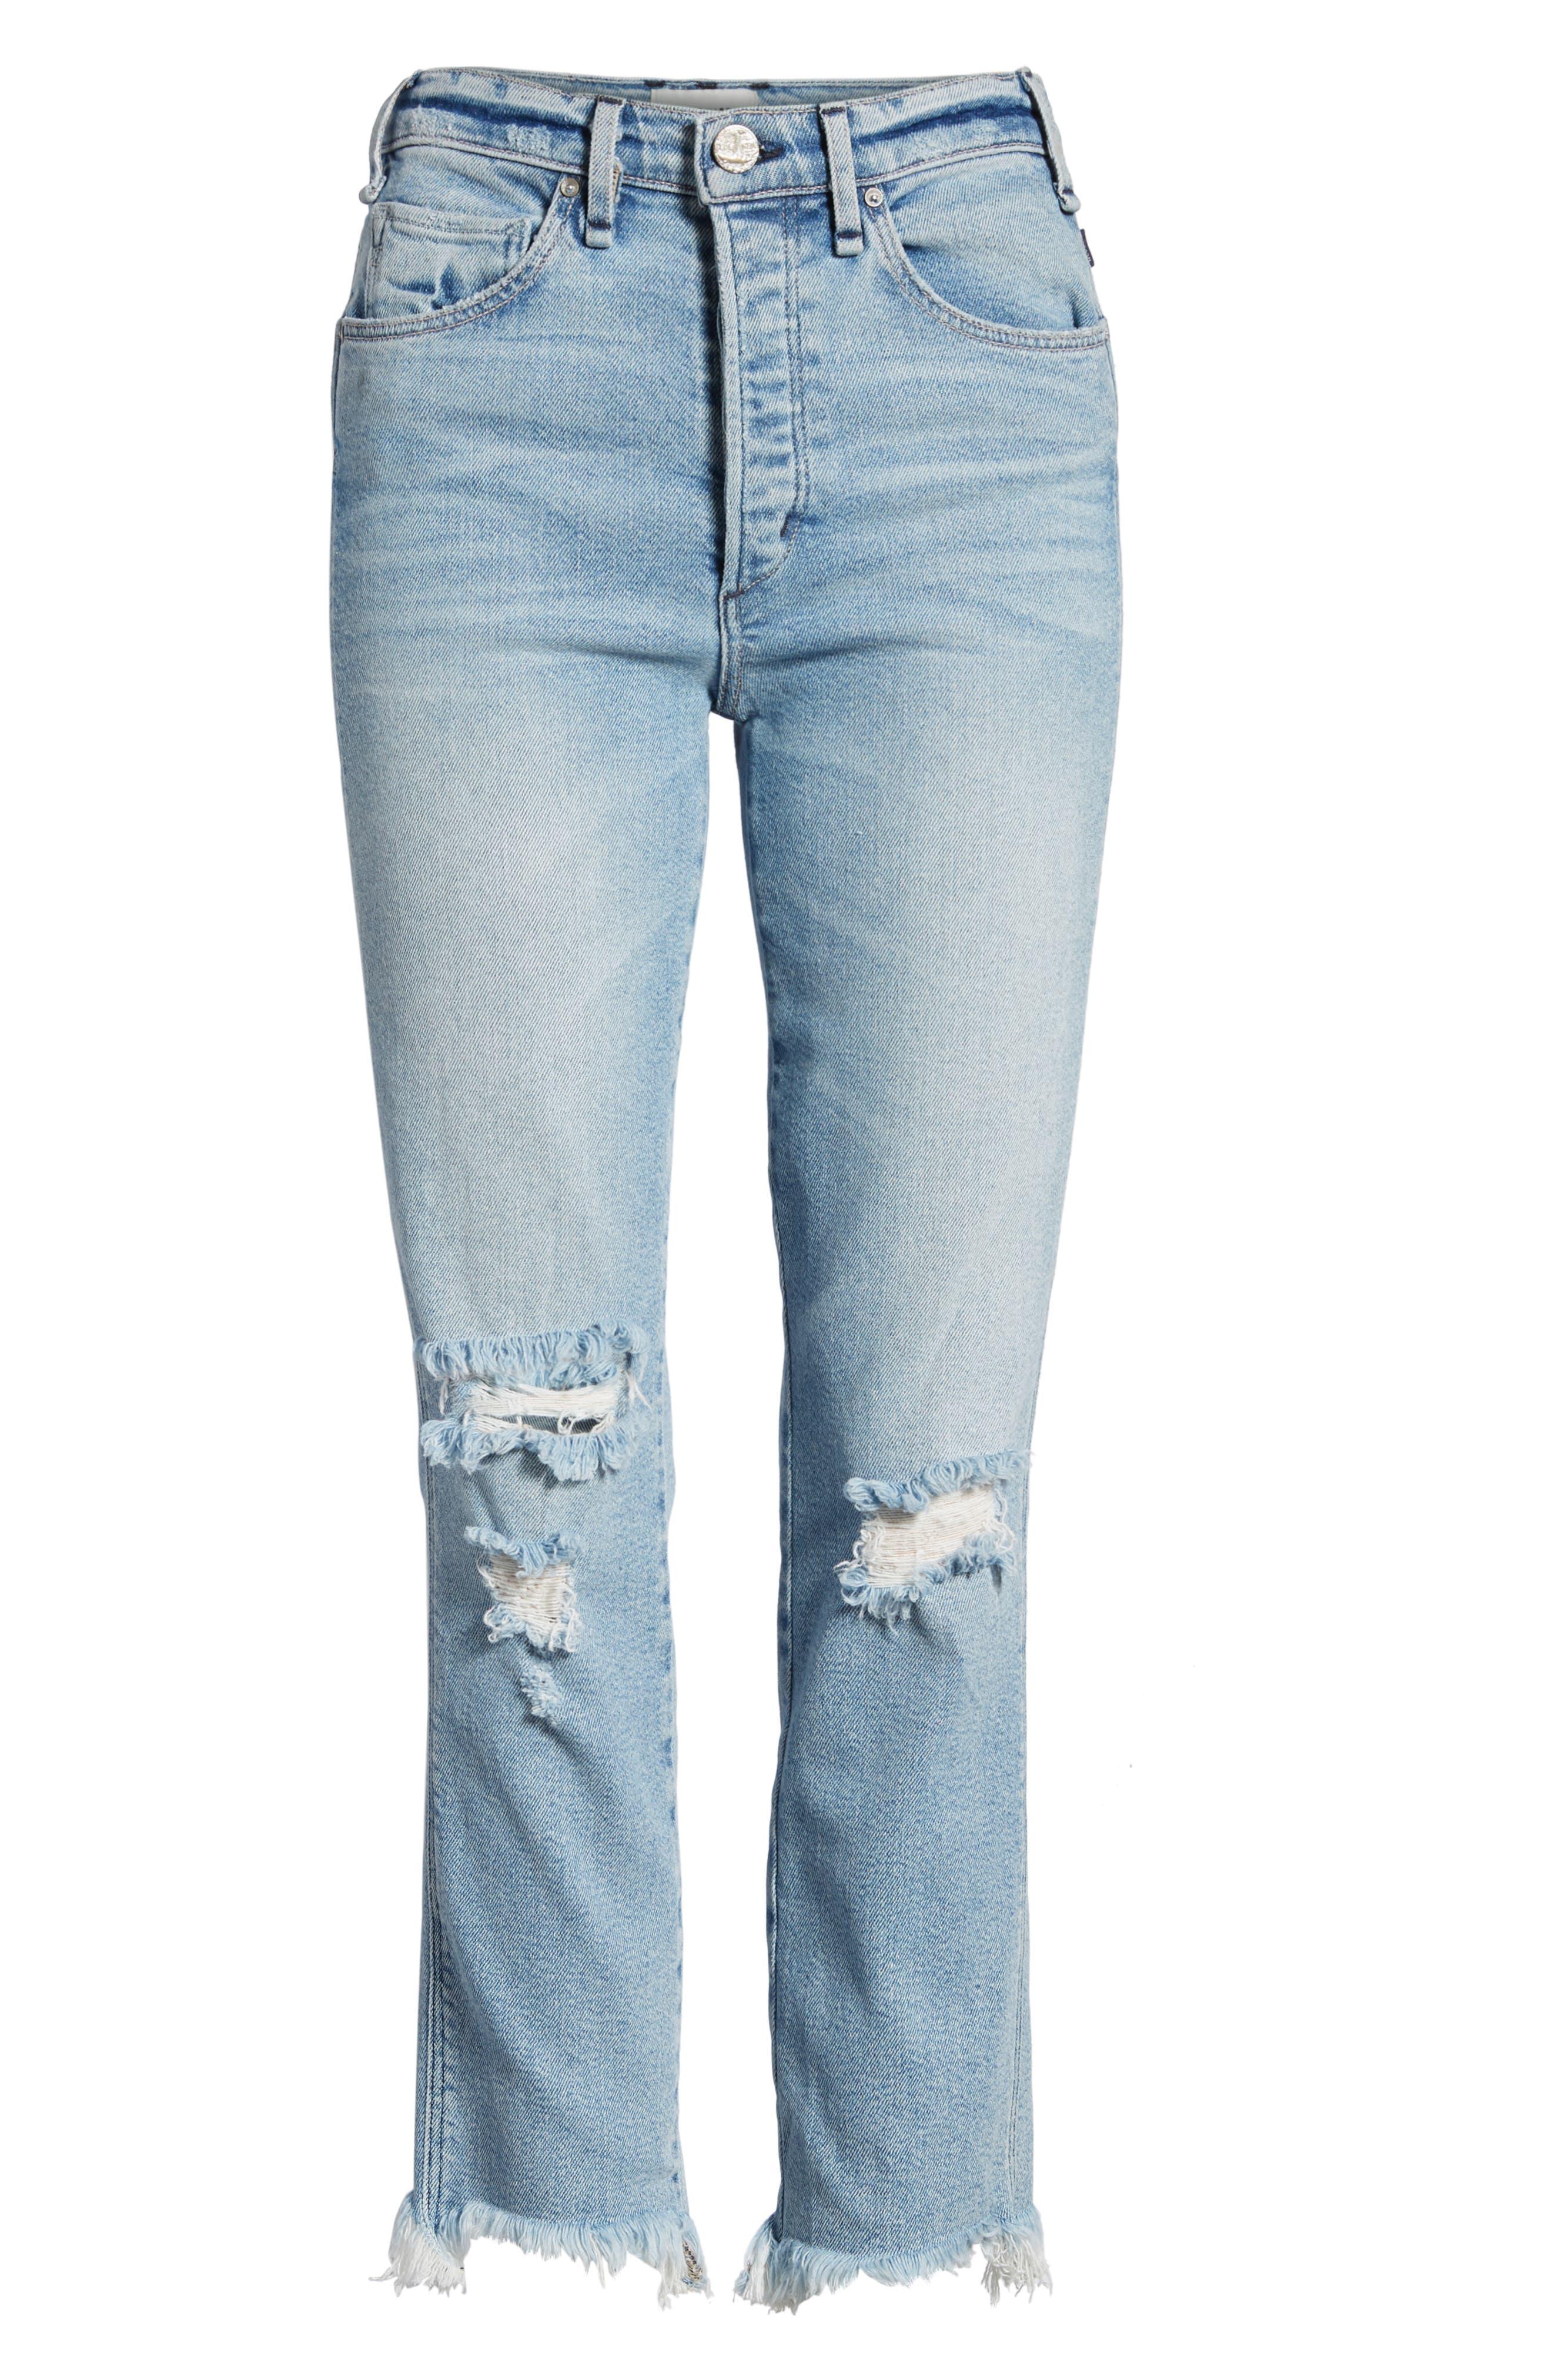 Valetta High Waist Crop Straight Leg Jeans,                             Alternate thumbnail 7, color,                             450